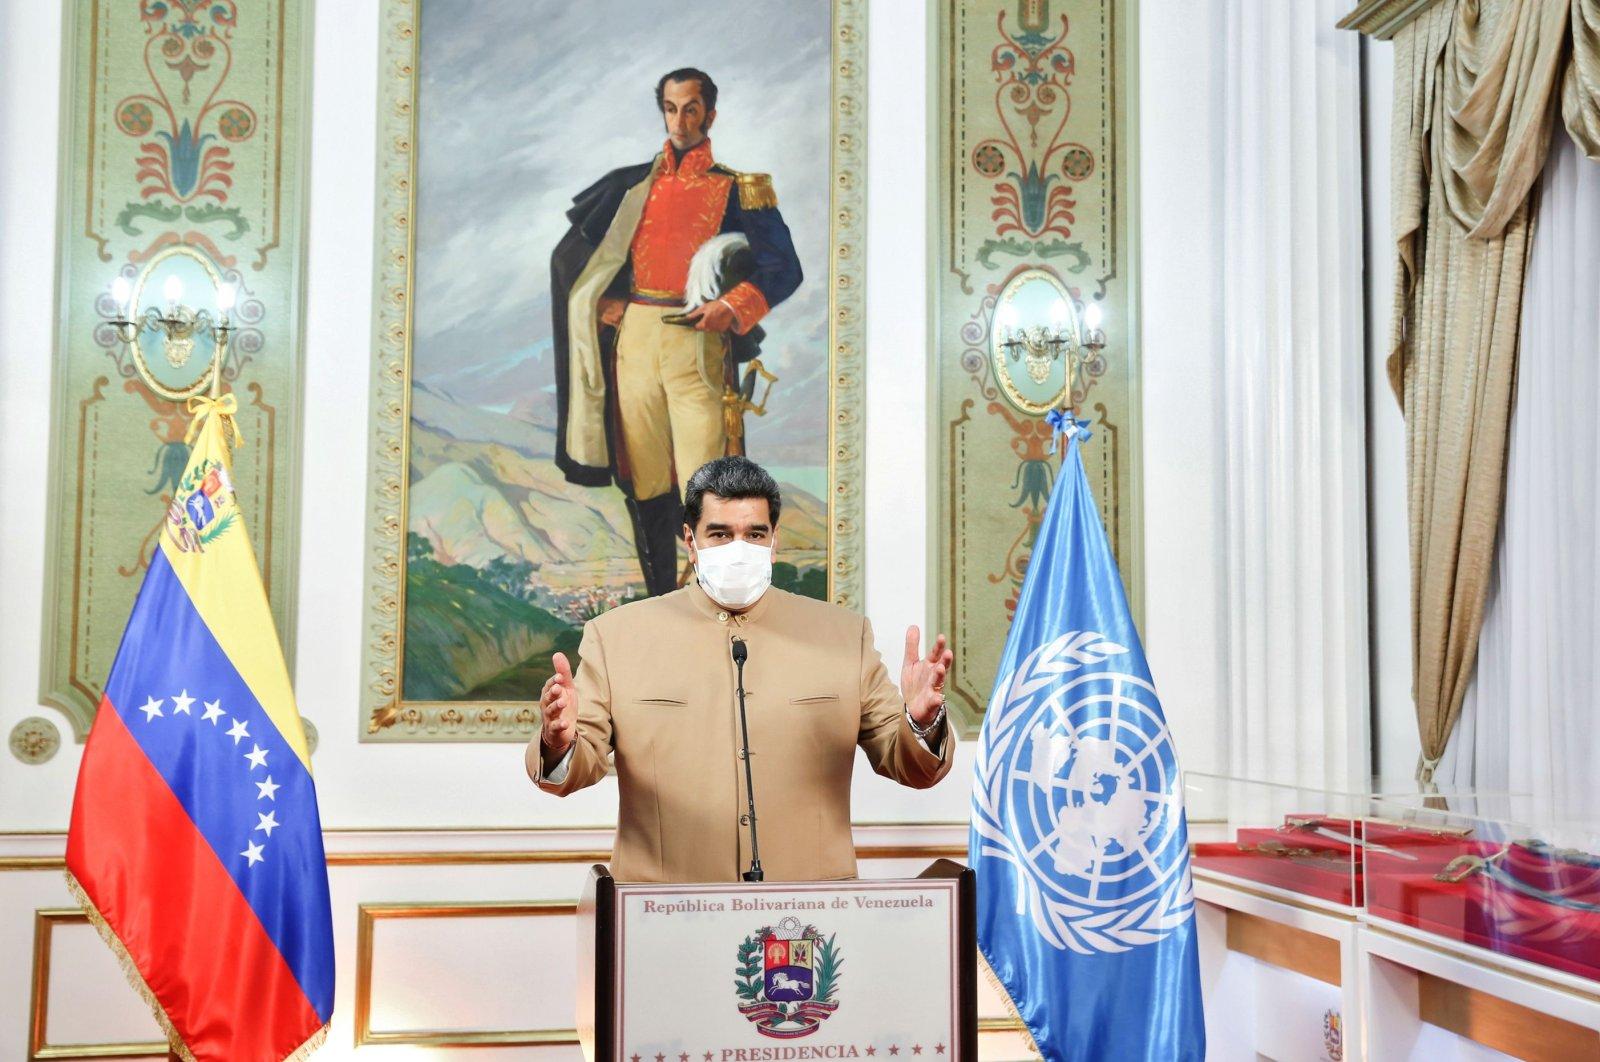 Venezuela's President Nicolas Maduro wears a mask as he gives a televised message from Miraflores Presidential Palace in Caracas, Venezuela, Sept. 21, 2020. (Venezuelan Presidency handout/AFP)